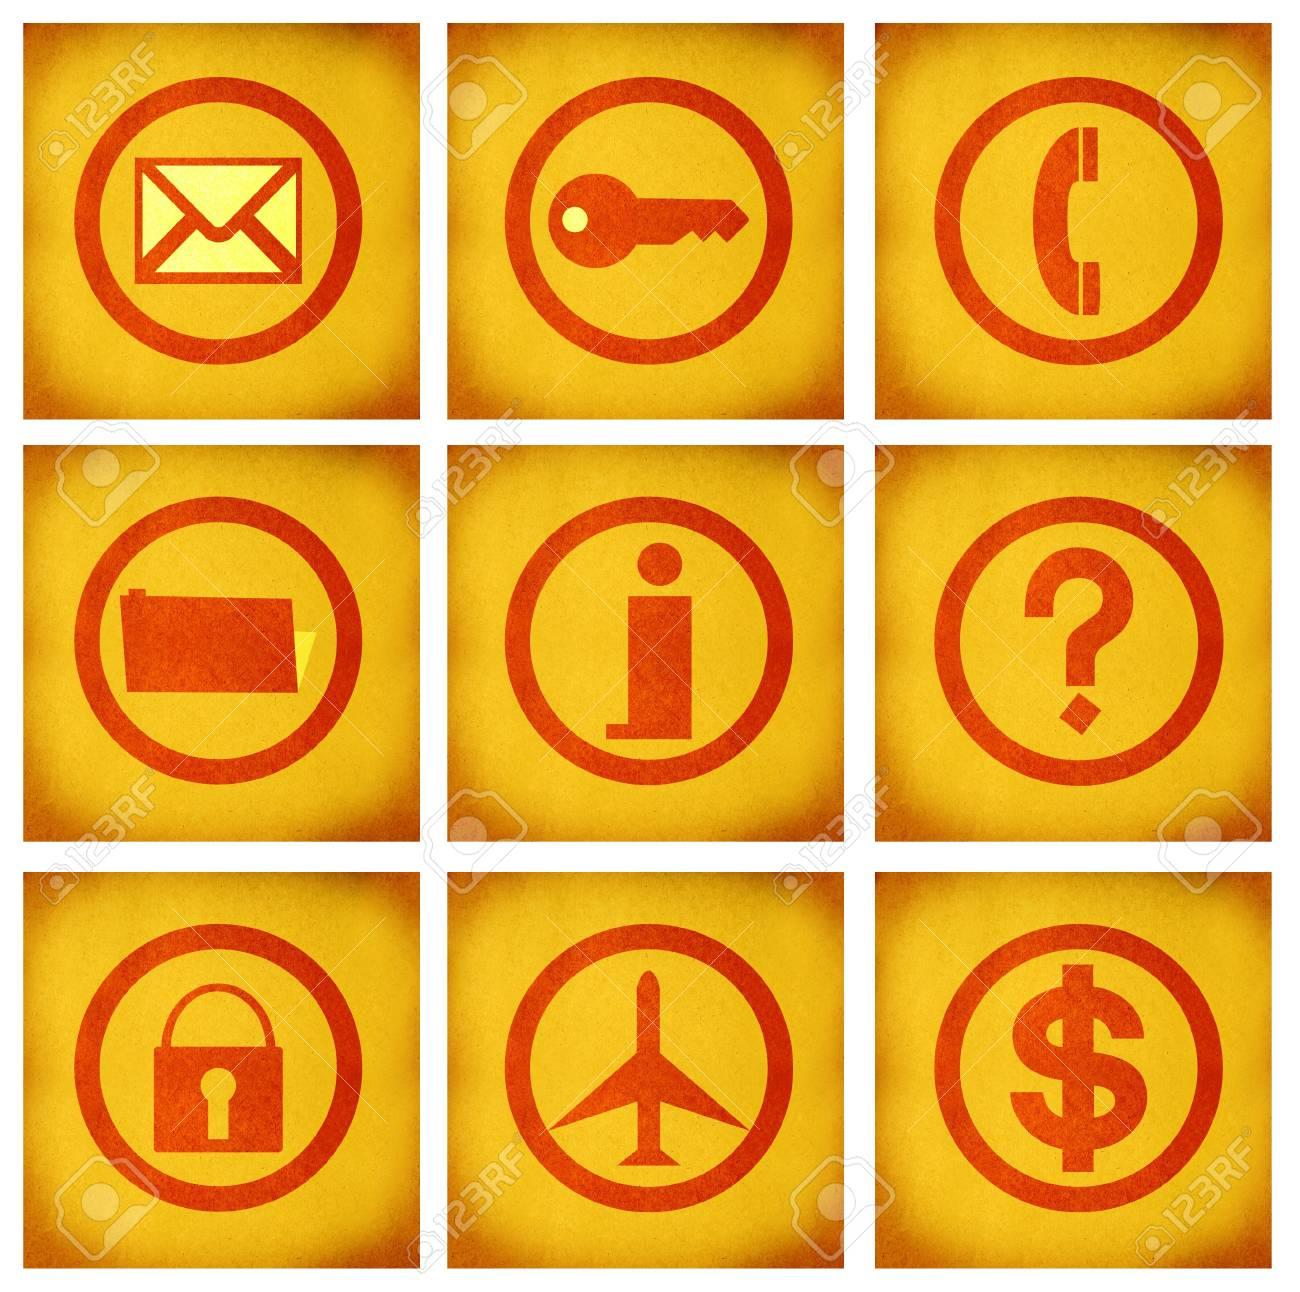 business icon set series on texture background Stock Photo - 2514756